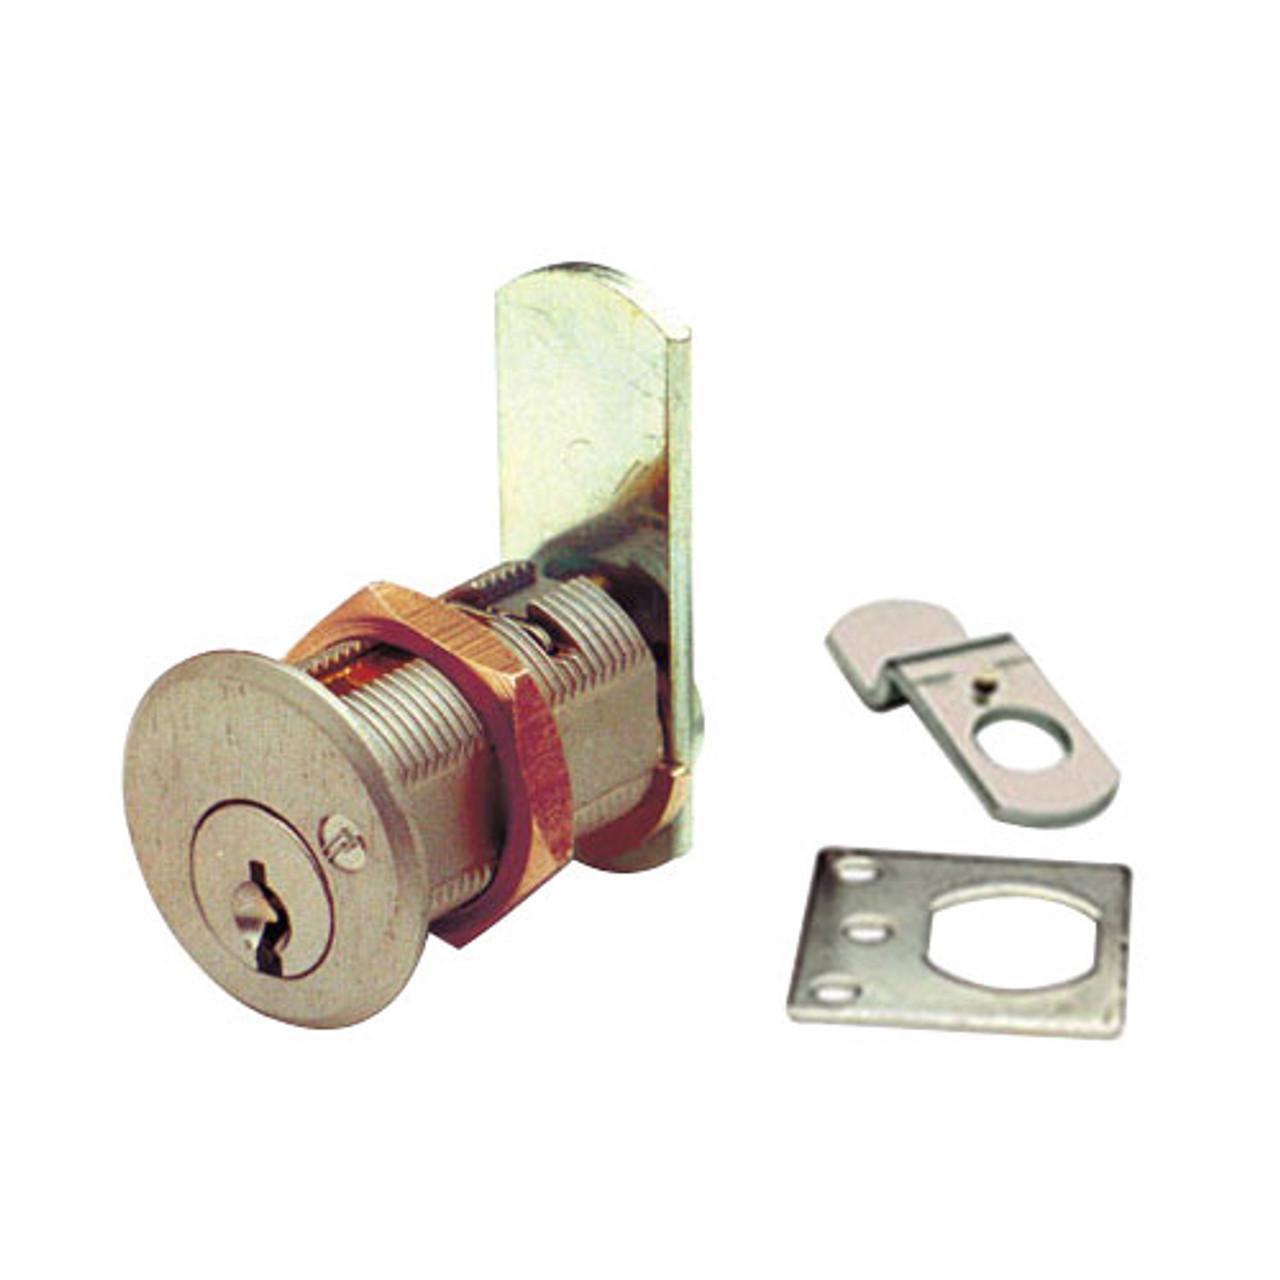 Olympus DCR4-KD-US3 Cam Locks in Bright Brass Finish